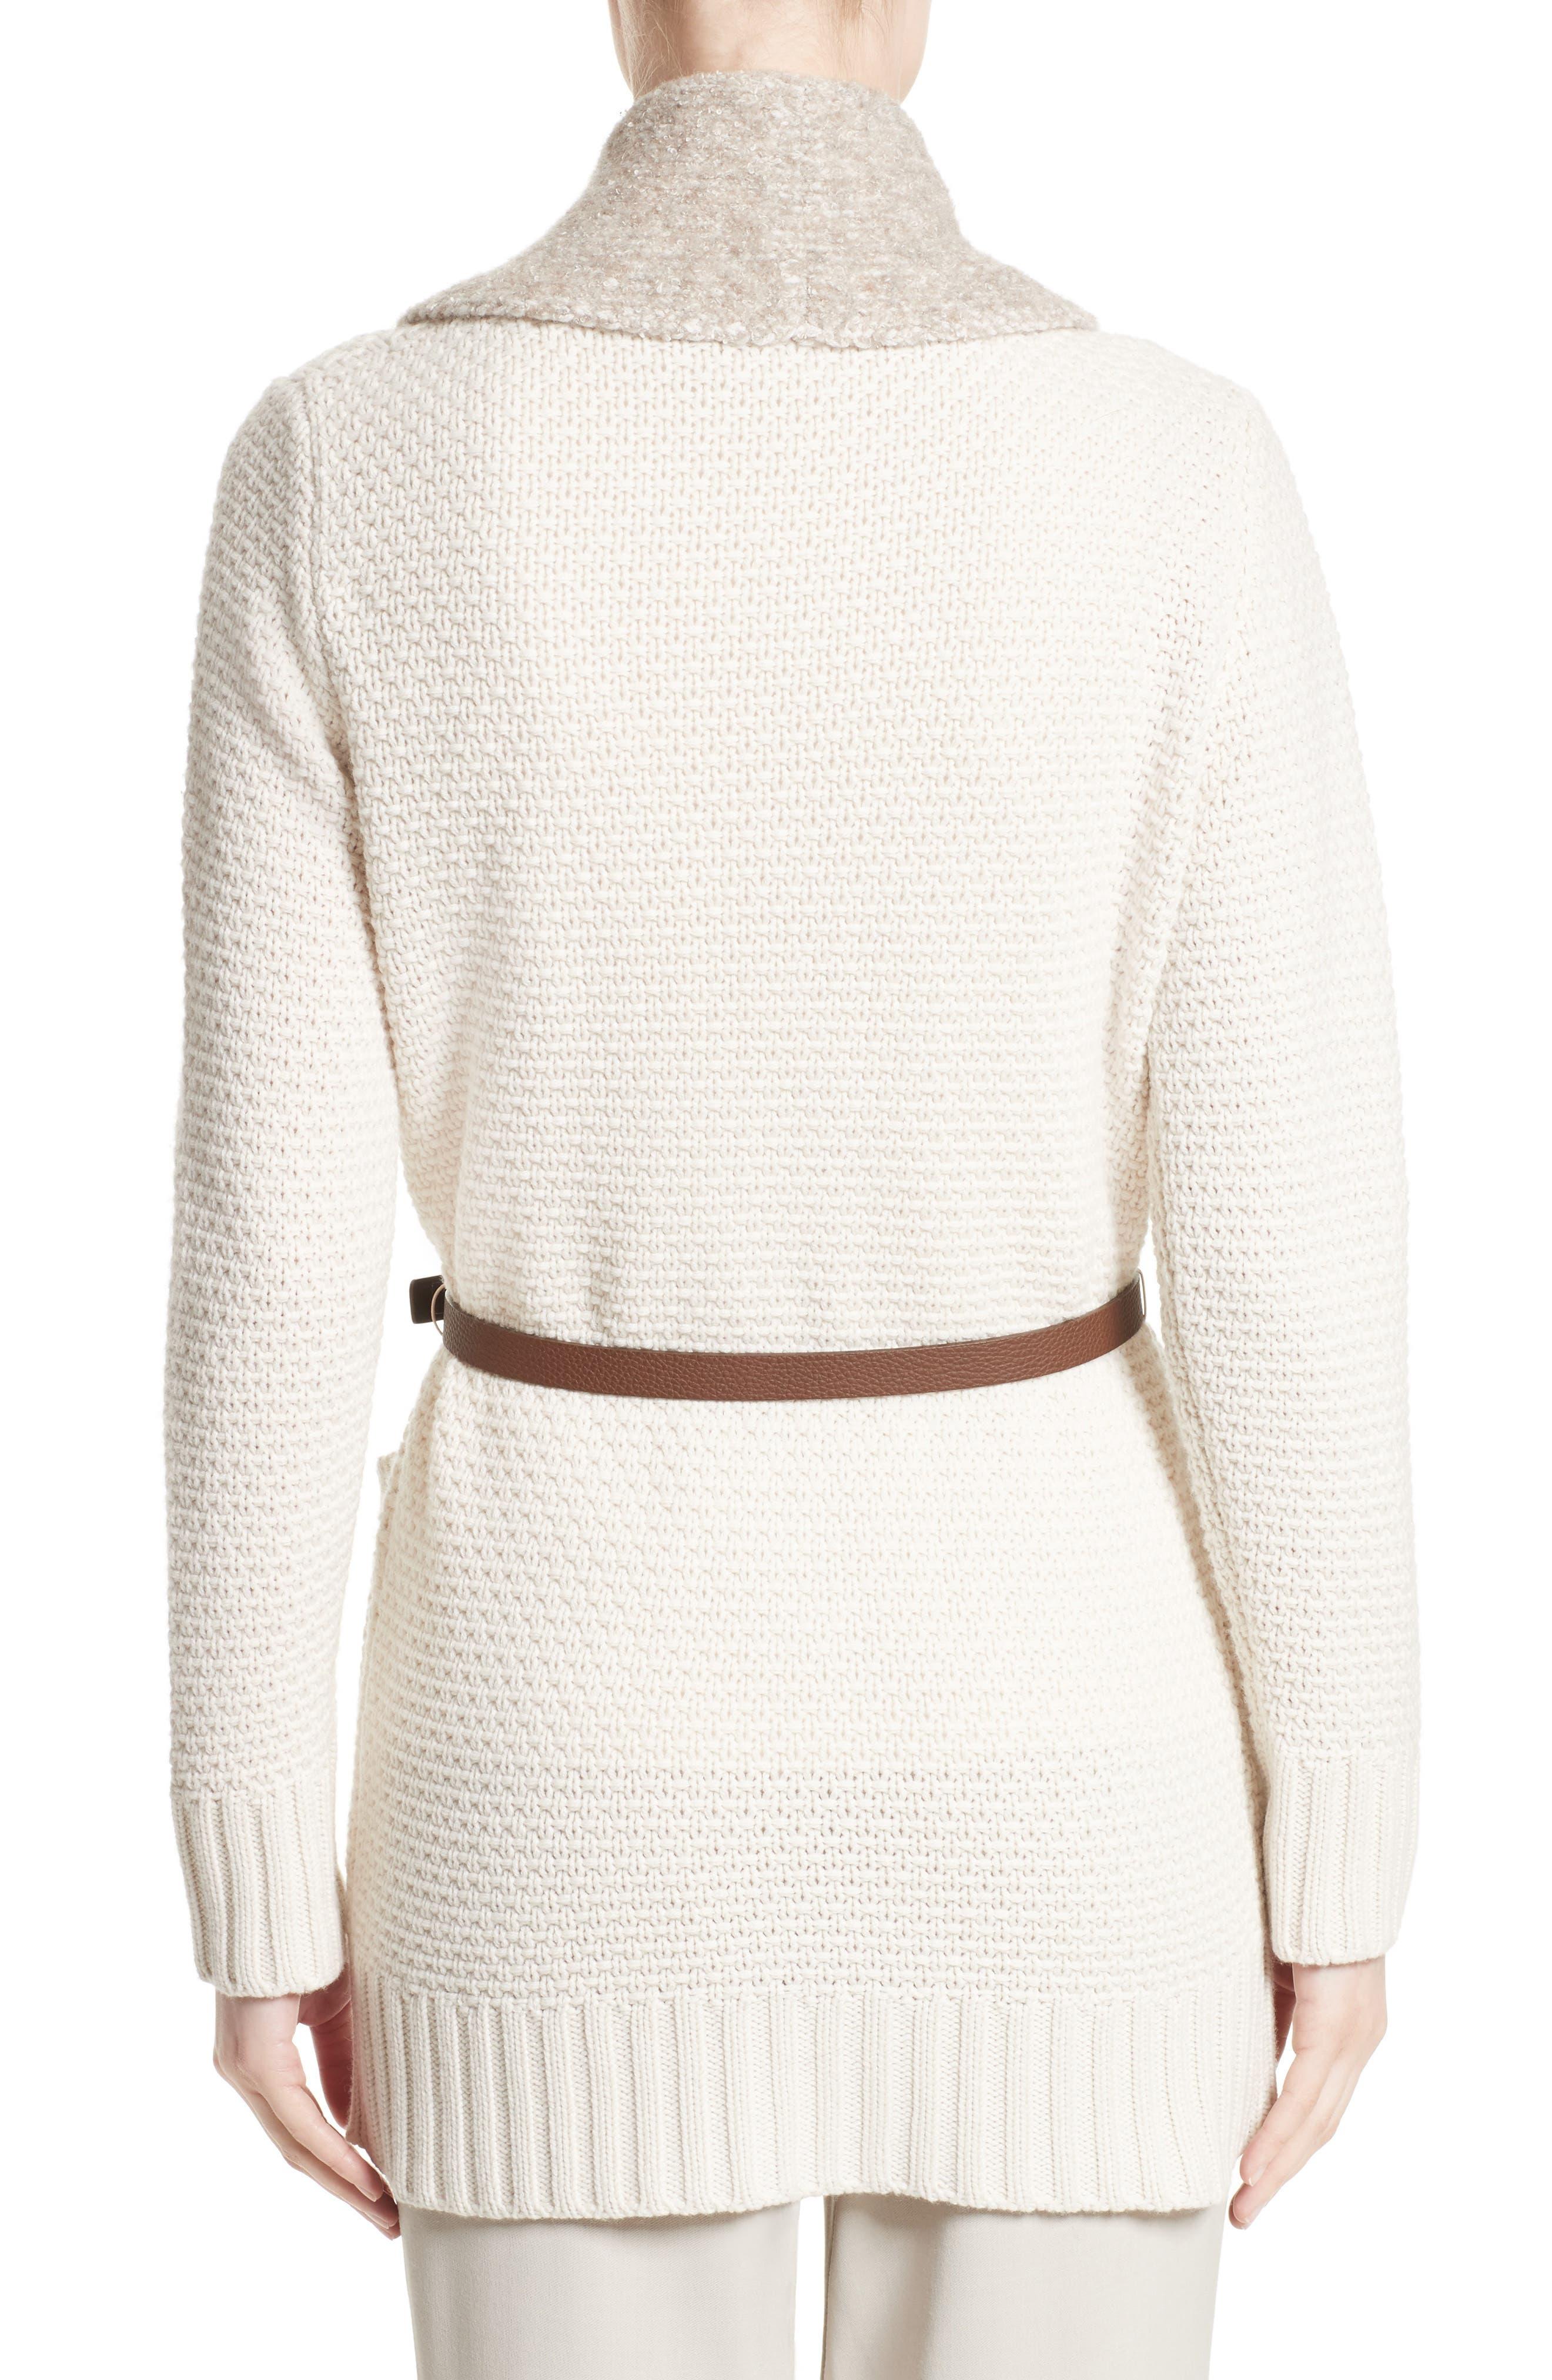 Wool, Silk & Cashmere Knit Cardigan,                             Alternate thumbnail 2, color,                             101